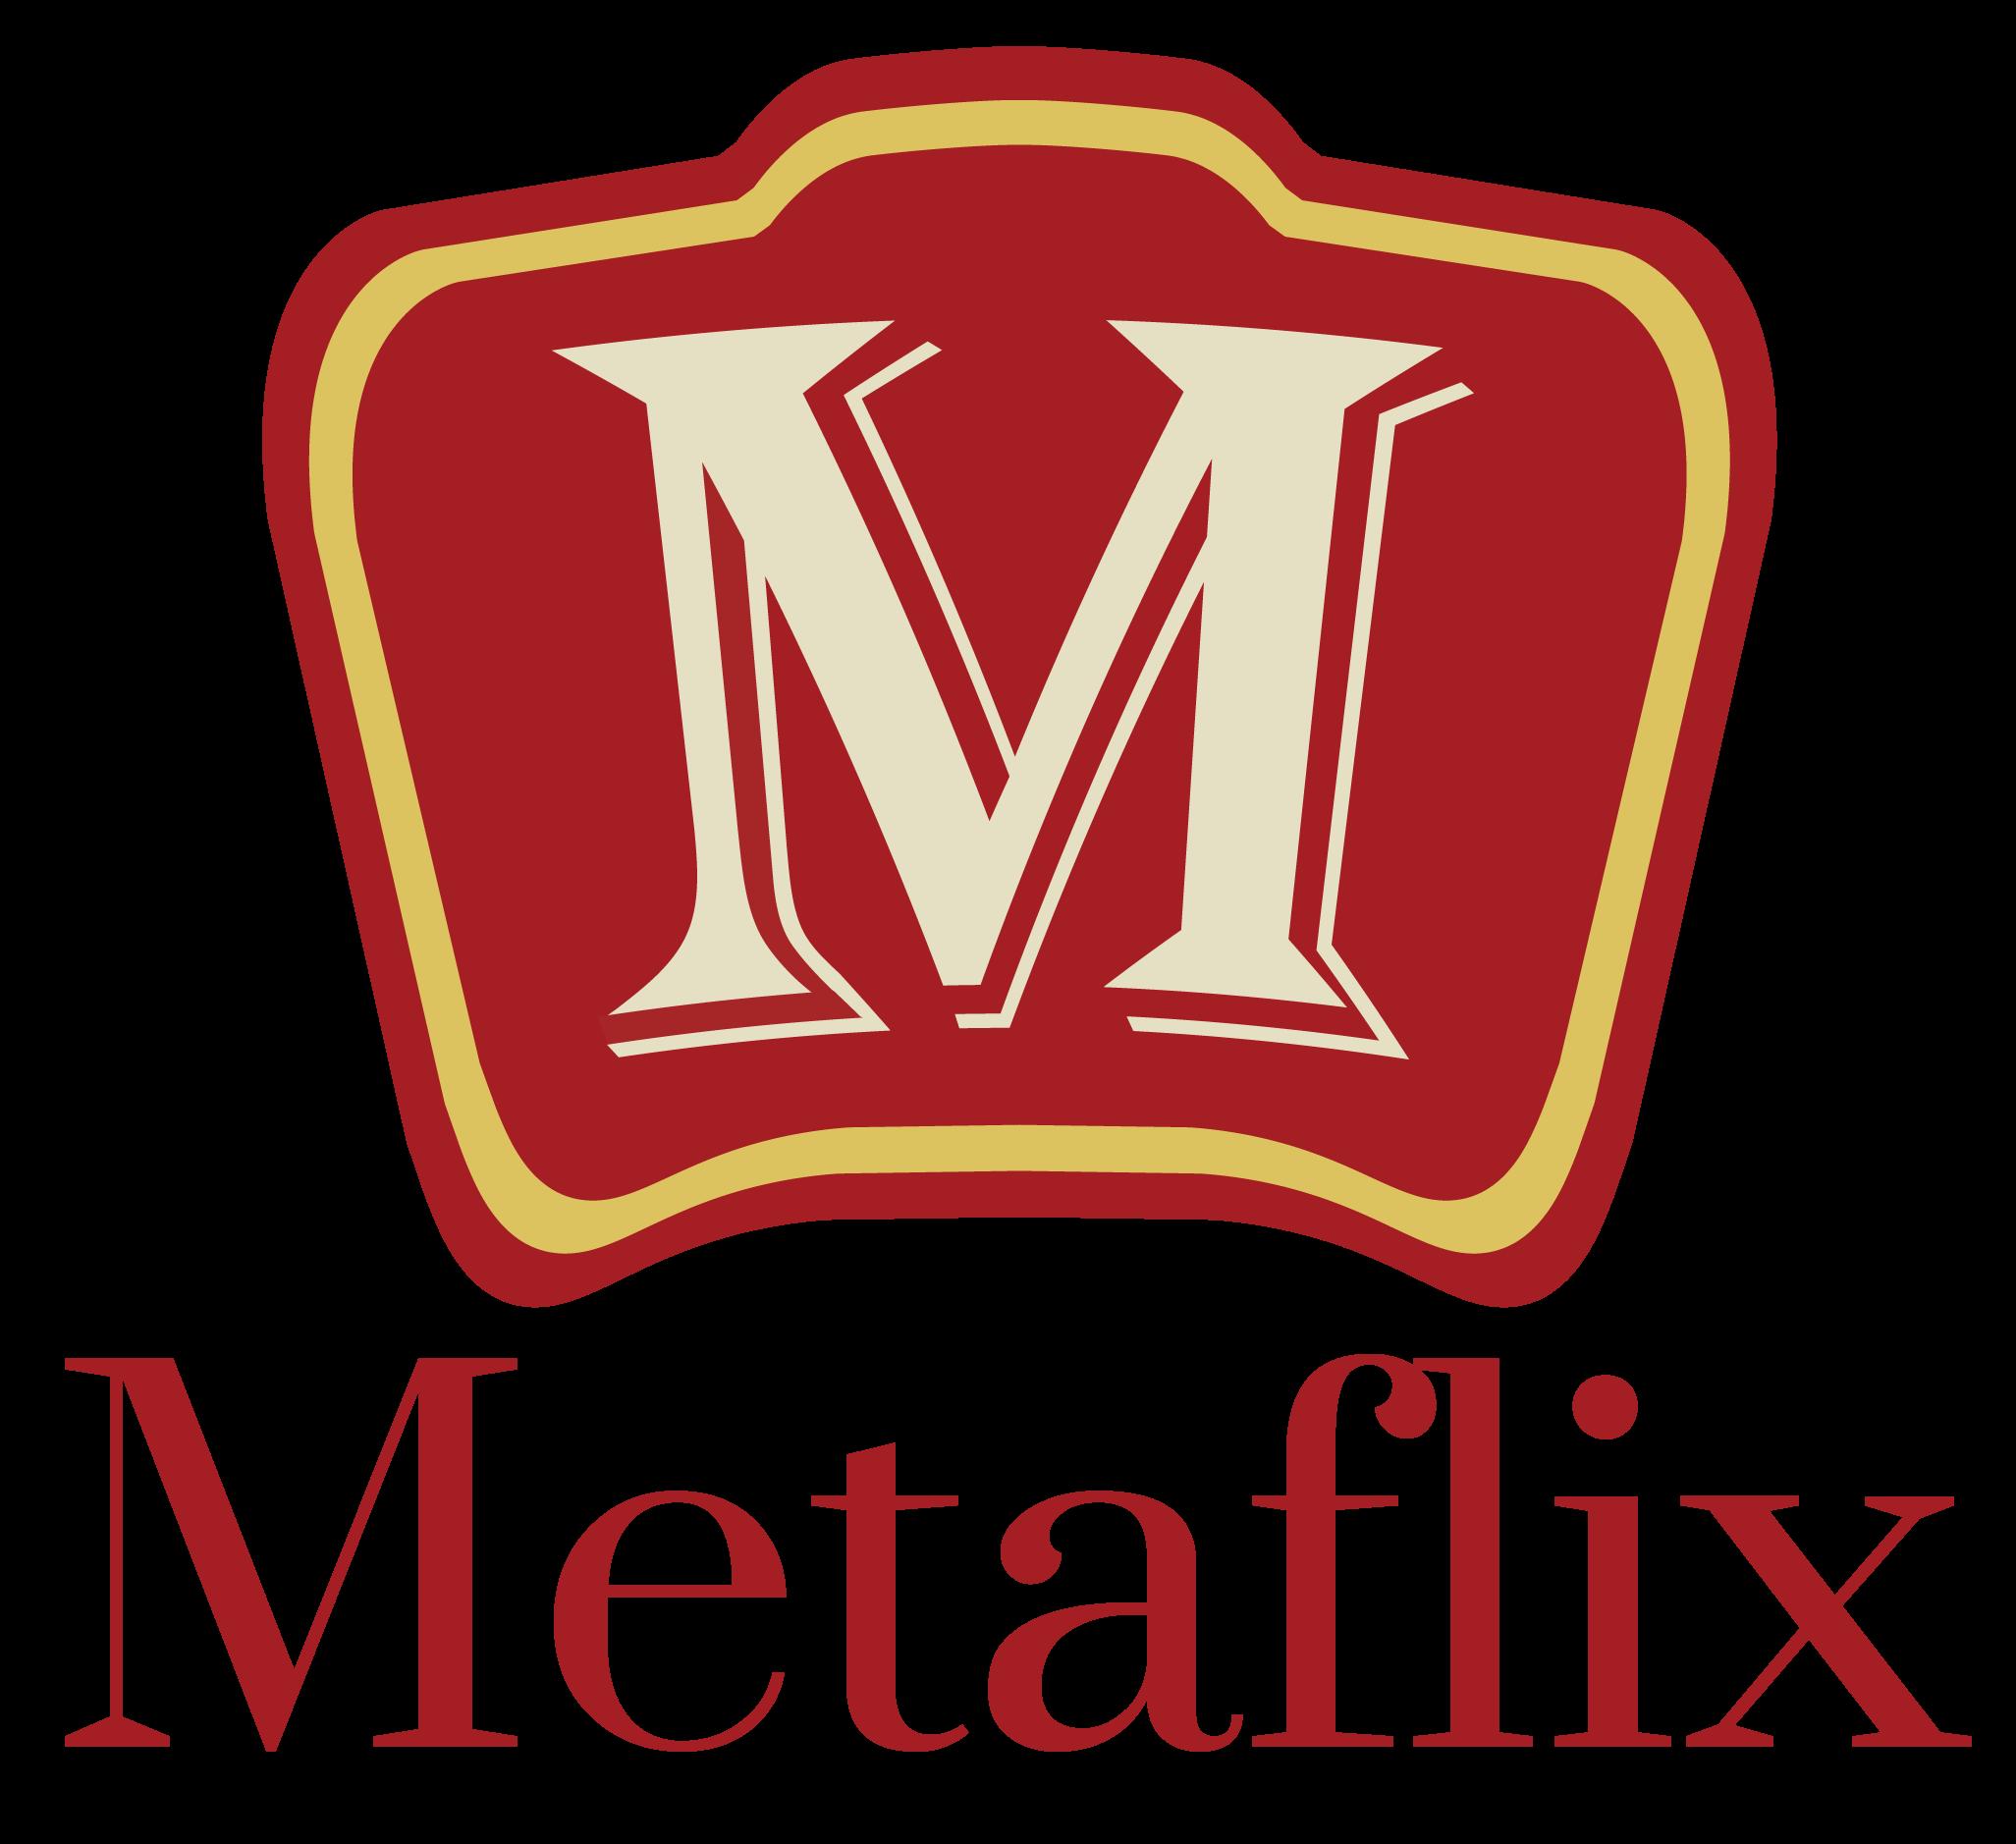 Metaflix Movie News Film Reviews And The World Of Cinema